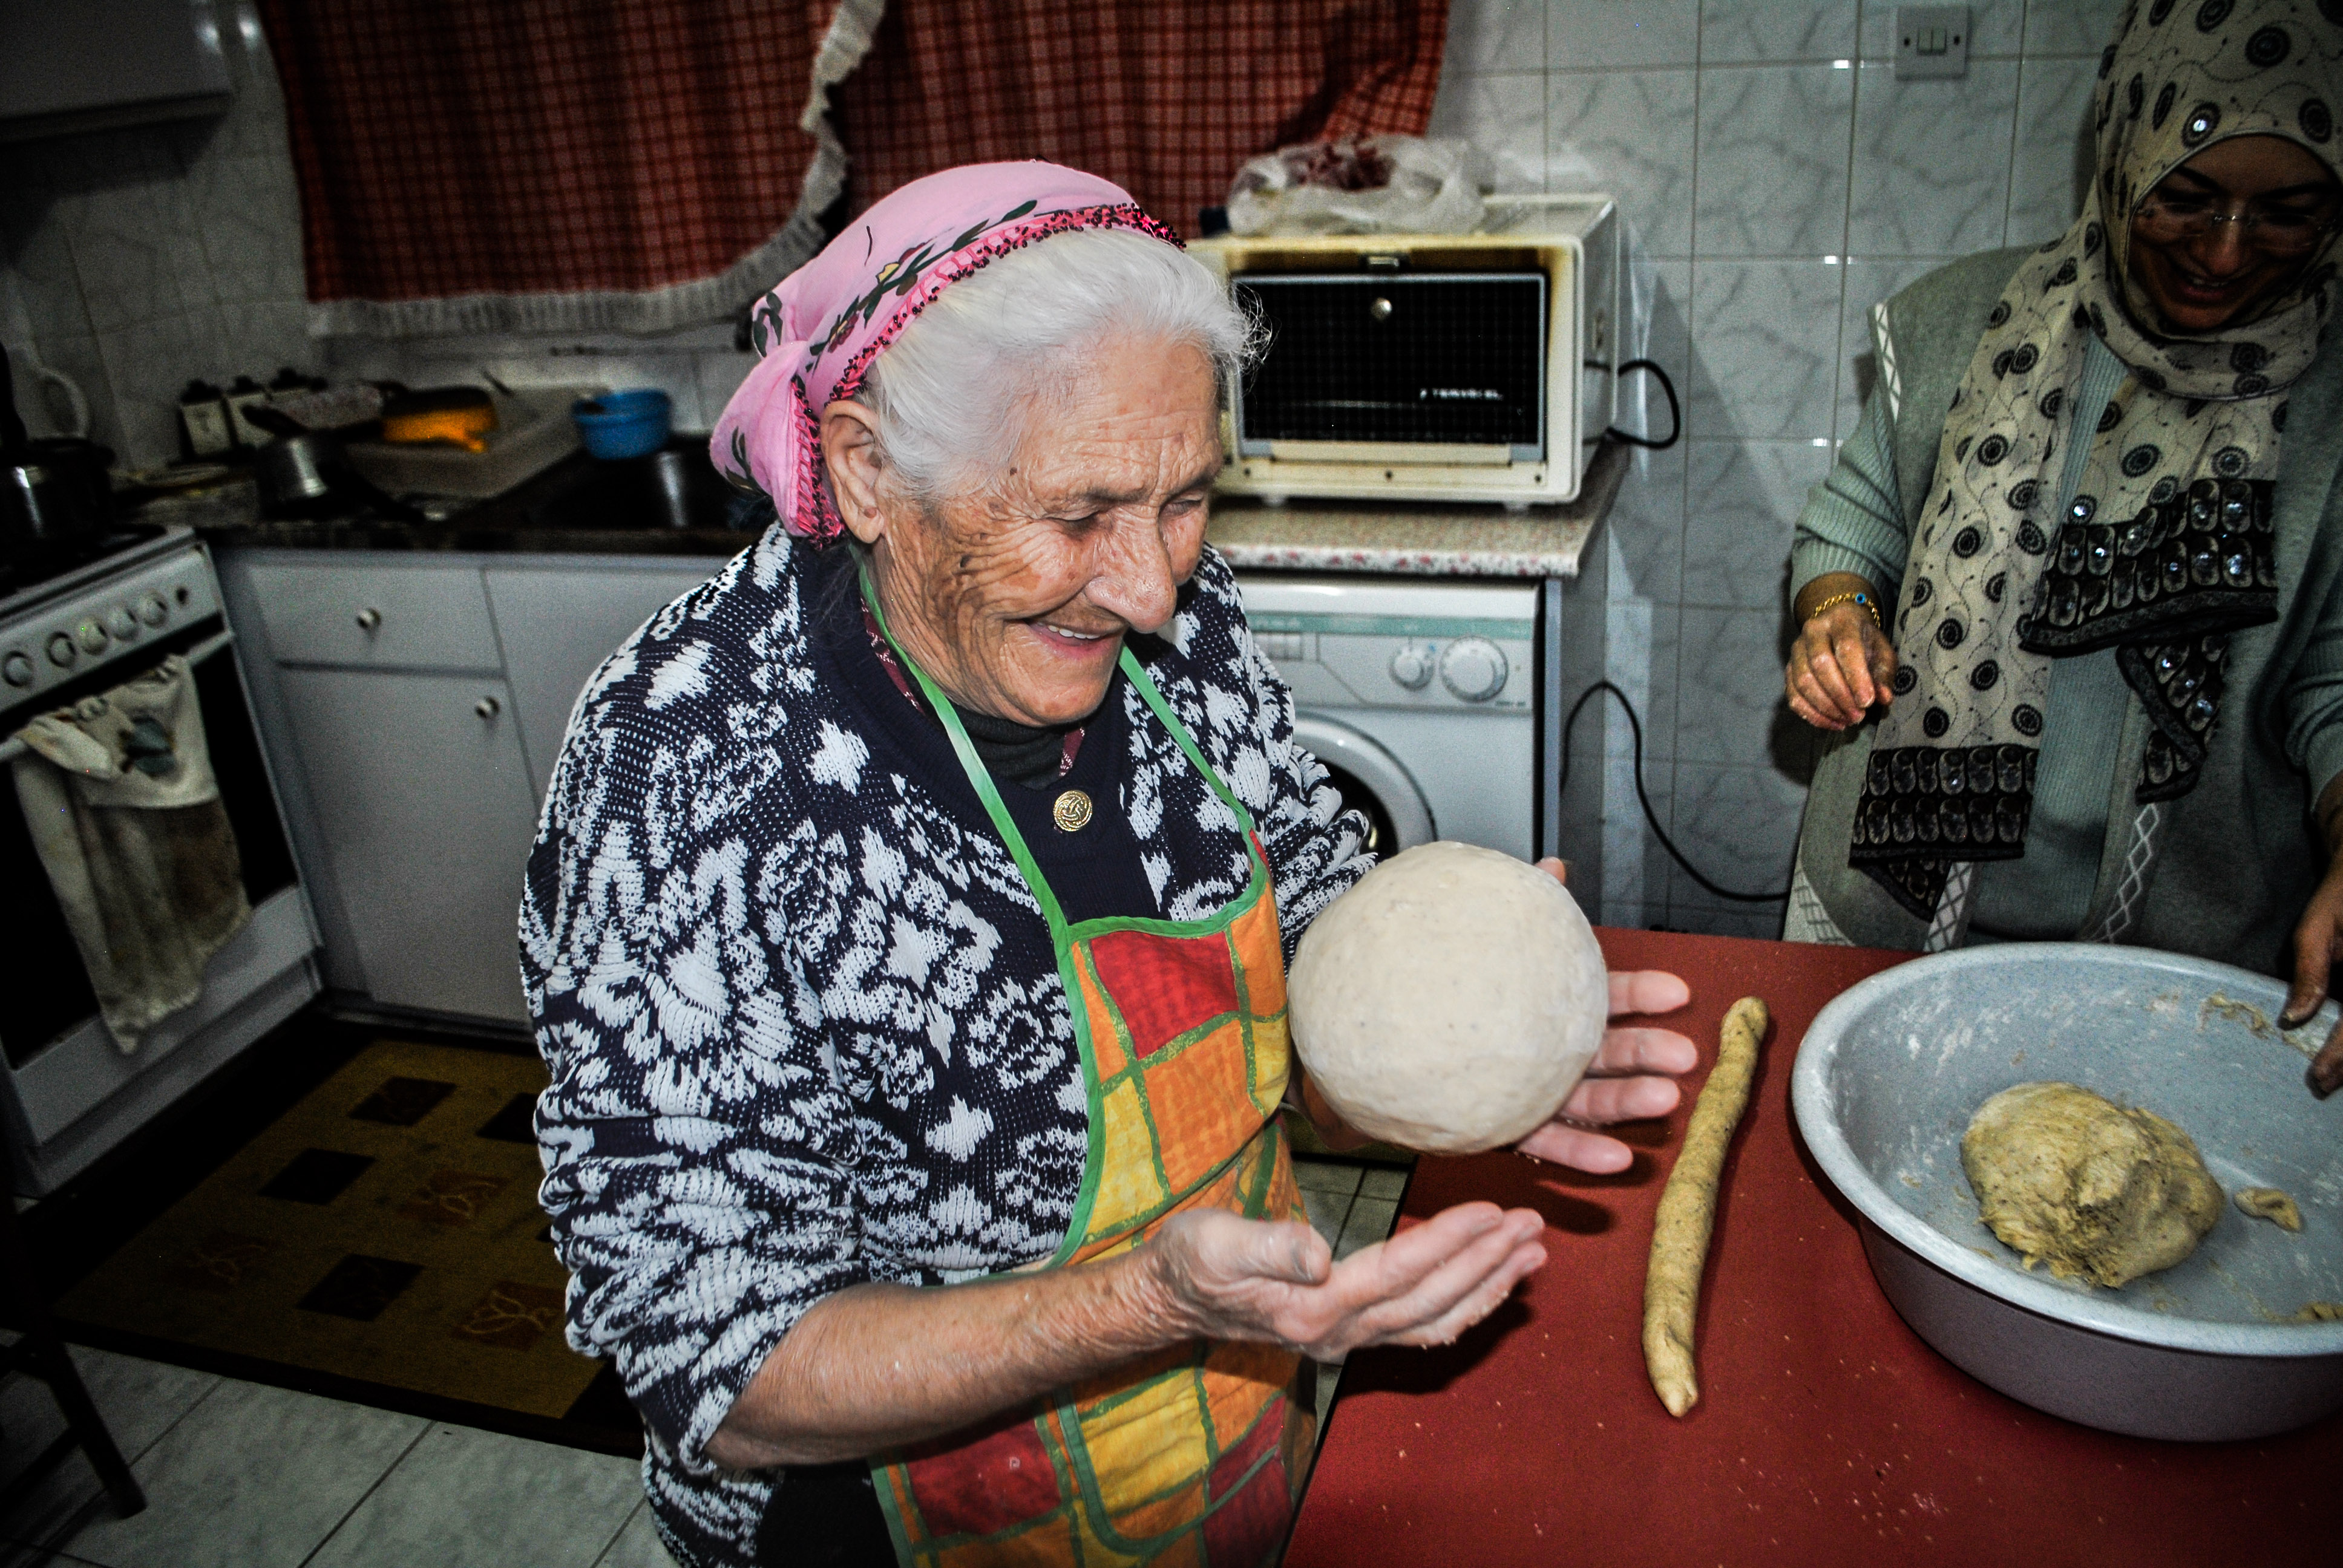 Fatimah & the 93-yr-old Bread Recipe